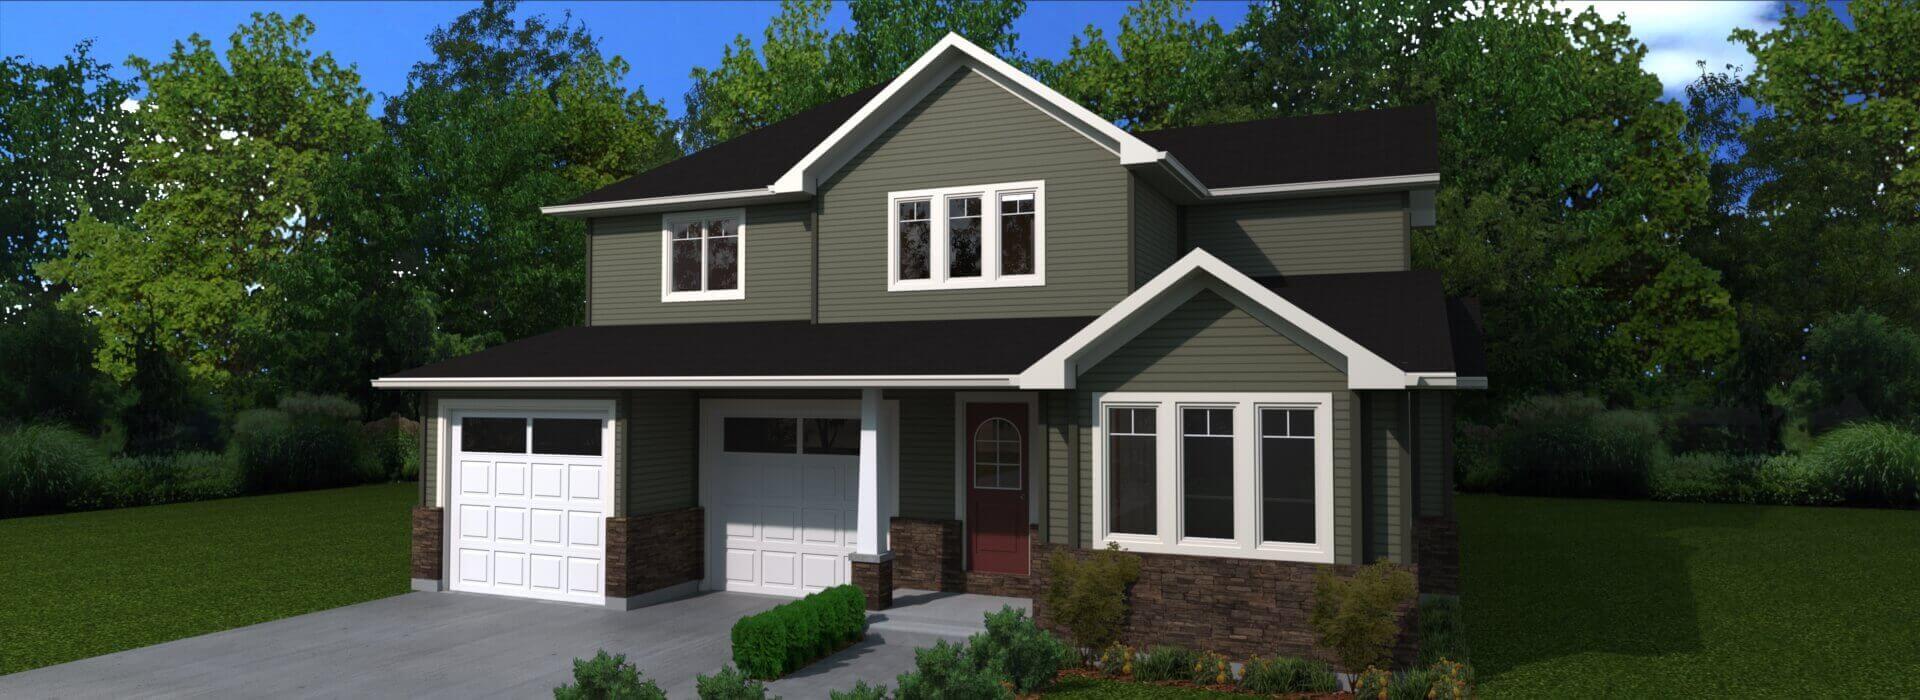 2105 house exterior